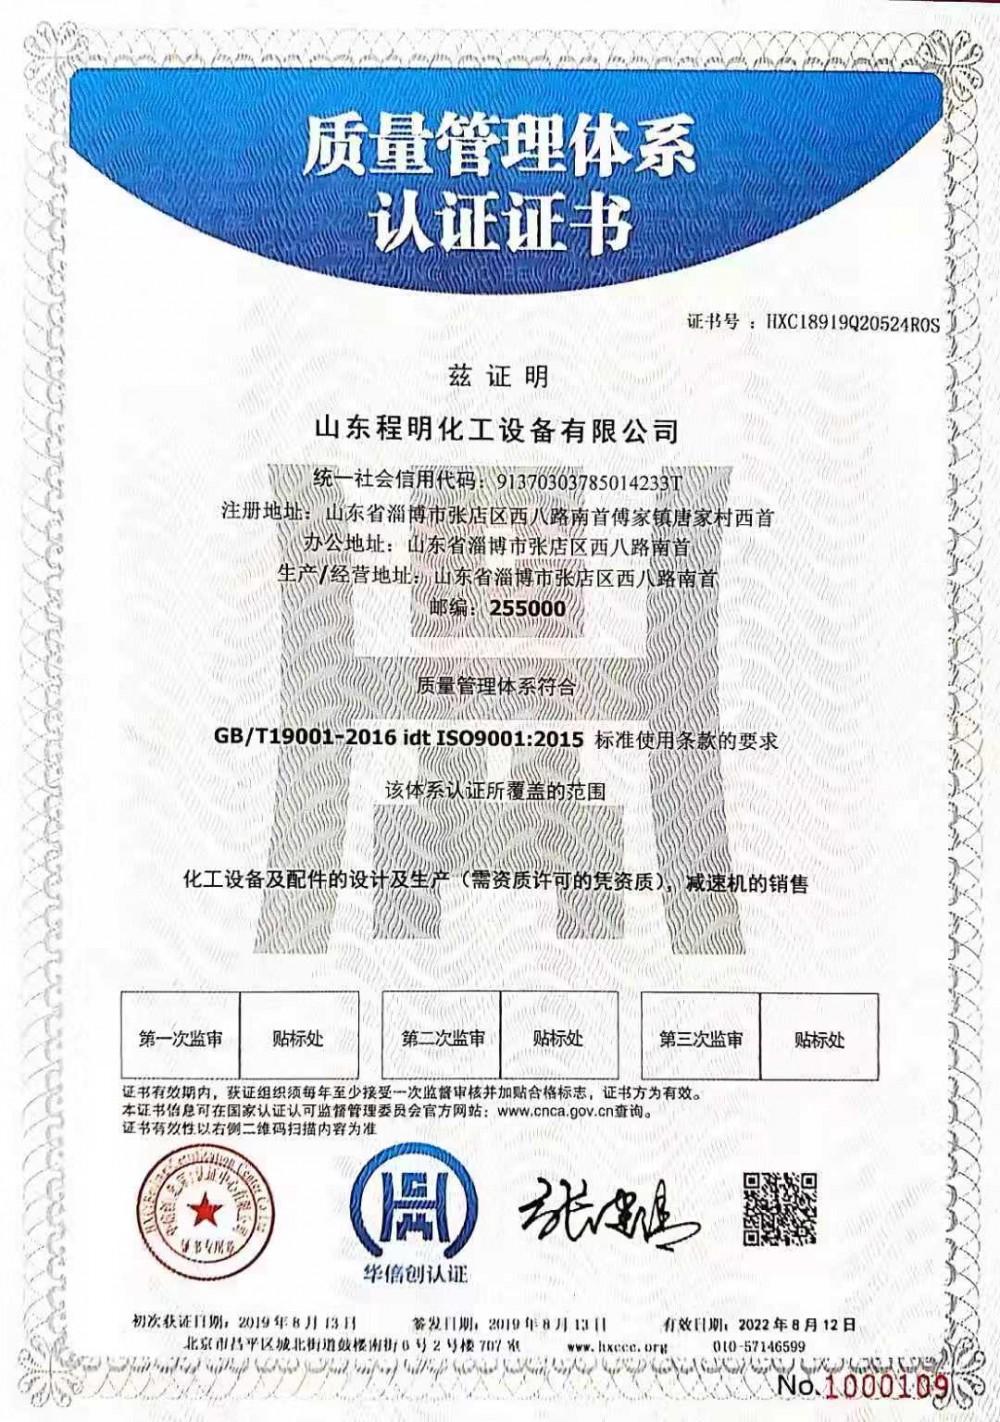 ISO9001:2015 质量体系认证证书